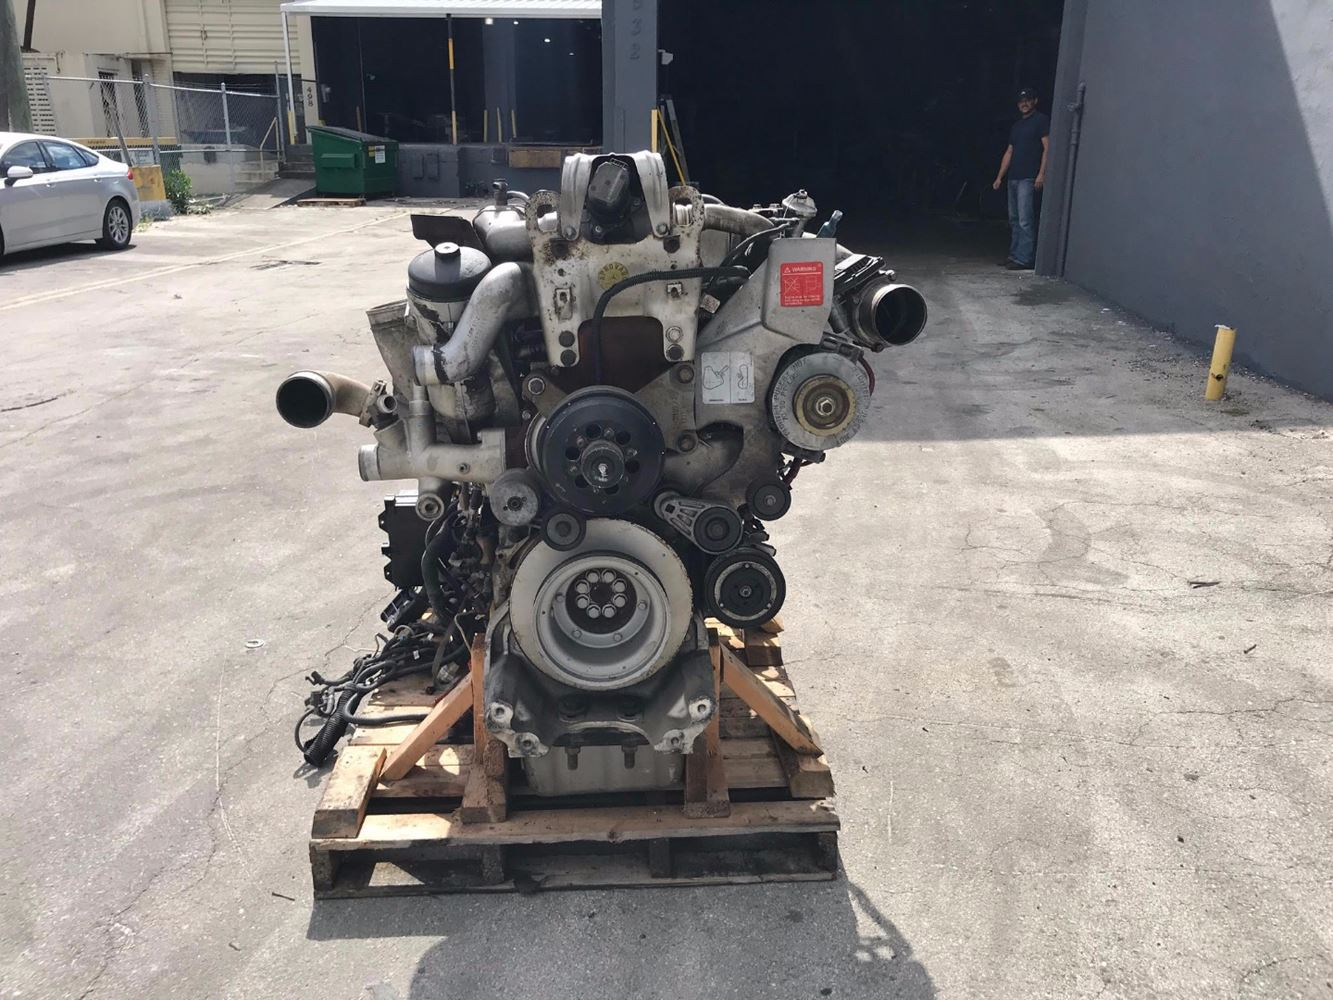 Mercedes OM460LA (Stock #003537) | Engine Assys | TPI